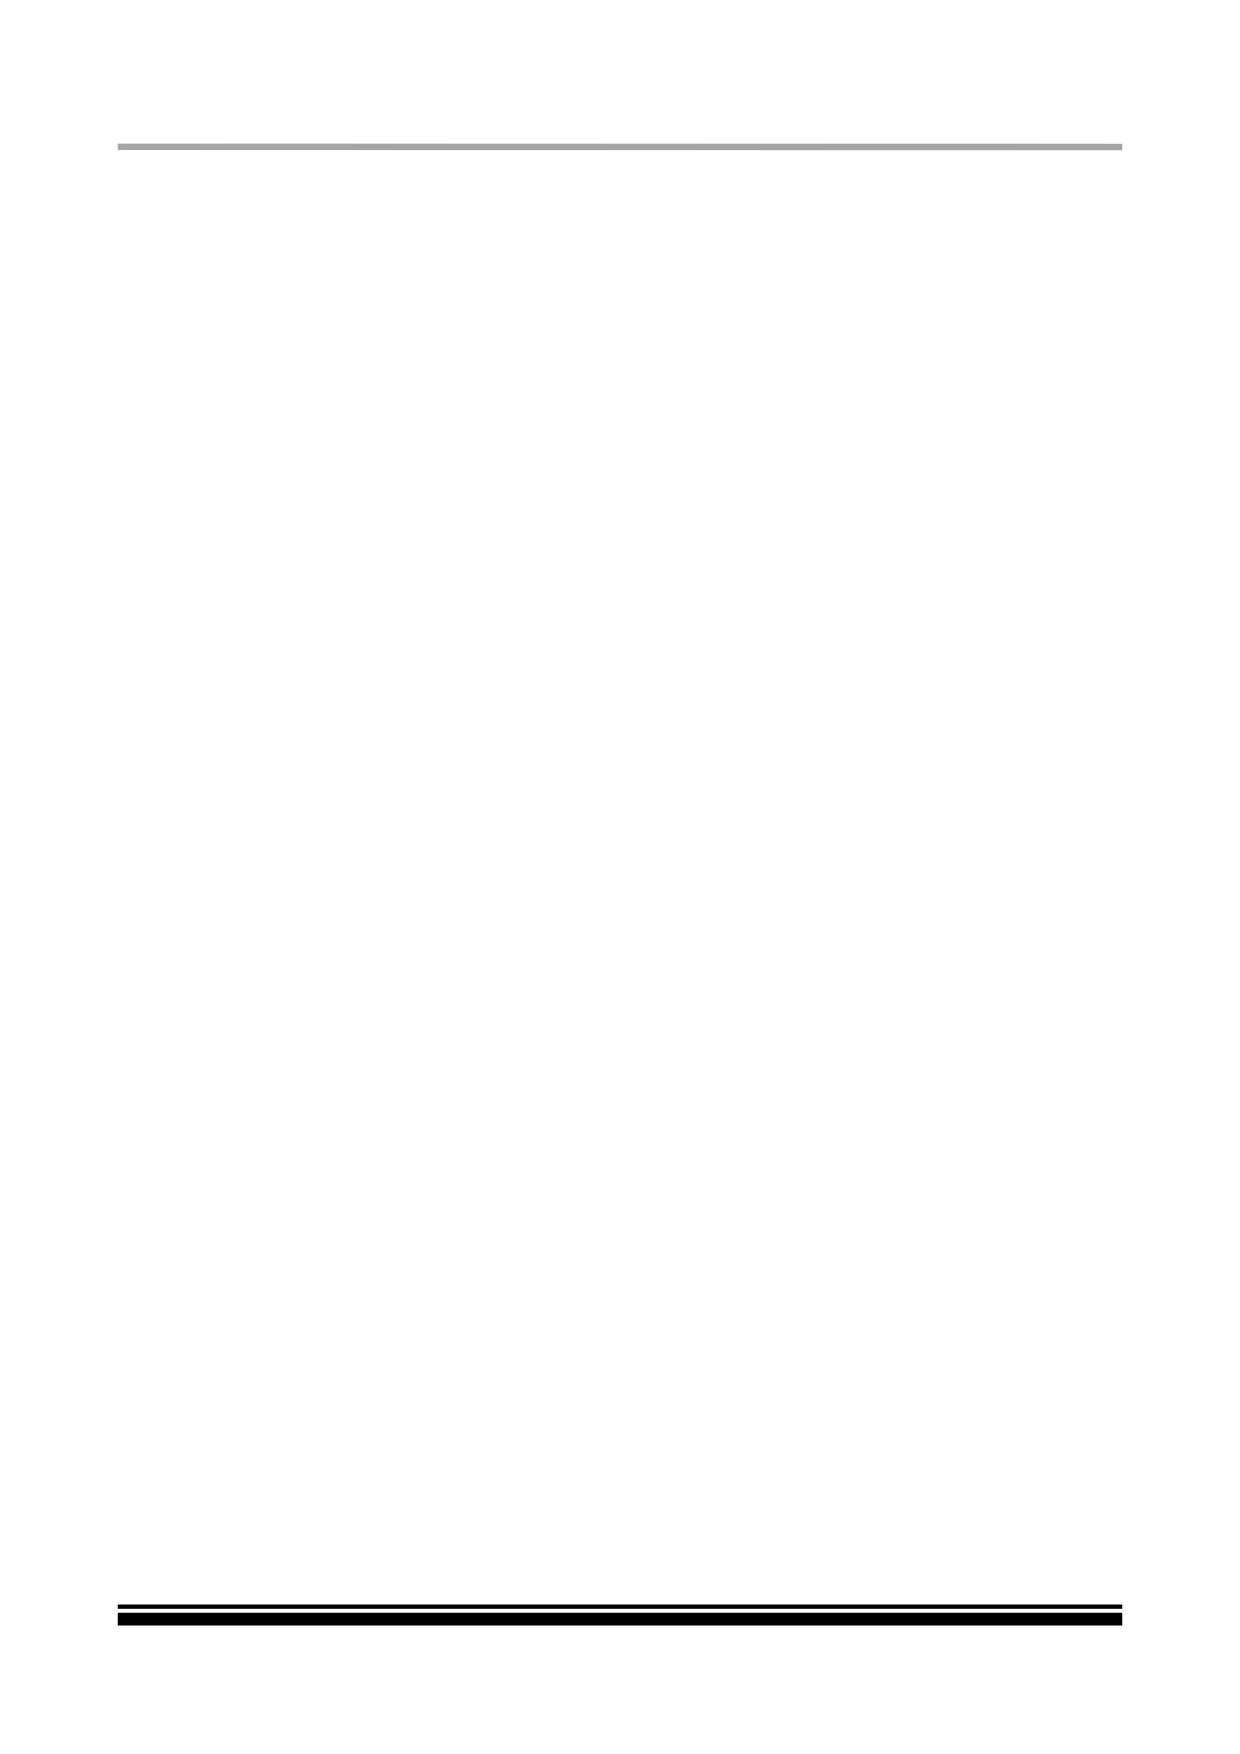 I3202-7HMT2432A Даташит, Описание, Даташиты